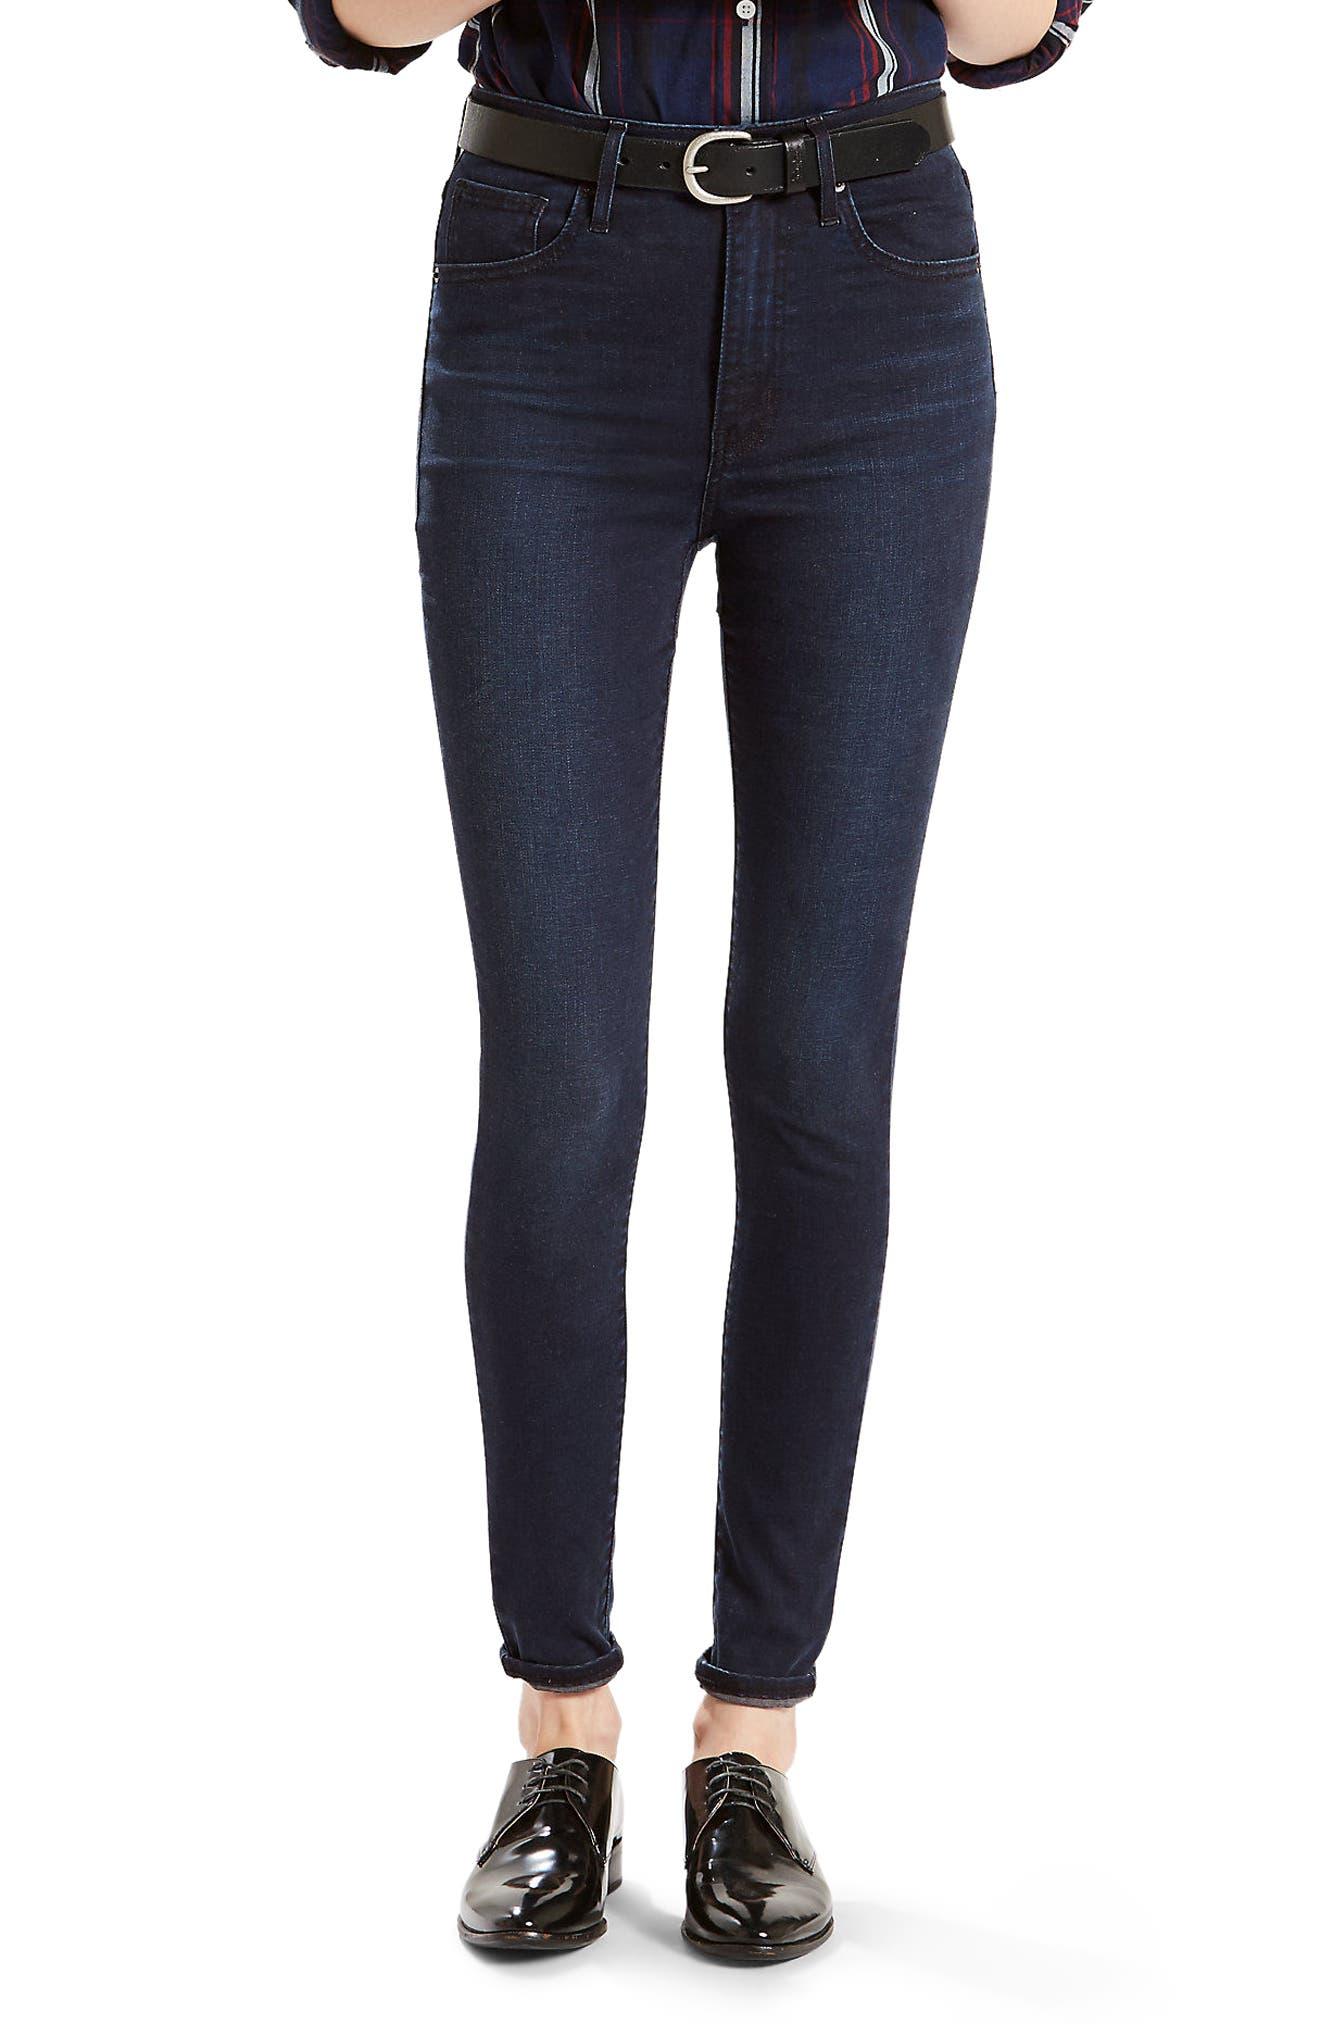 Mile High High Waist Super Skinny Jeans,                         Main,                         color, Red Wonder